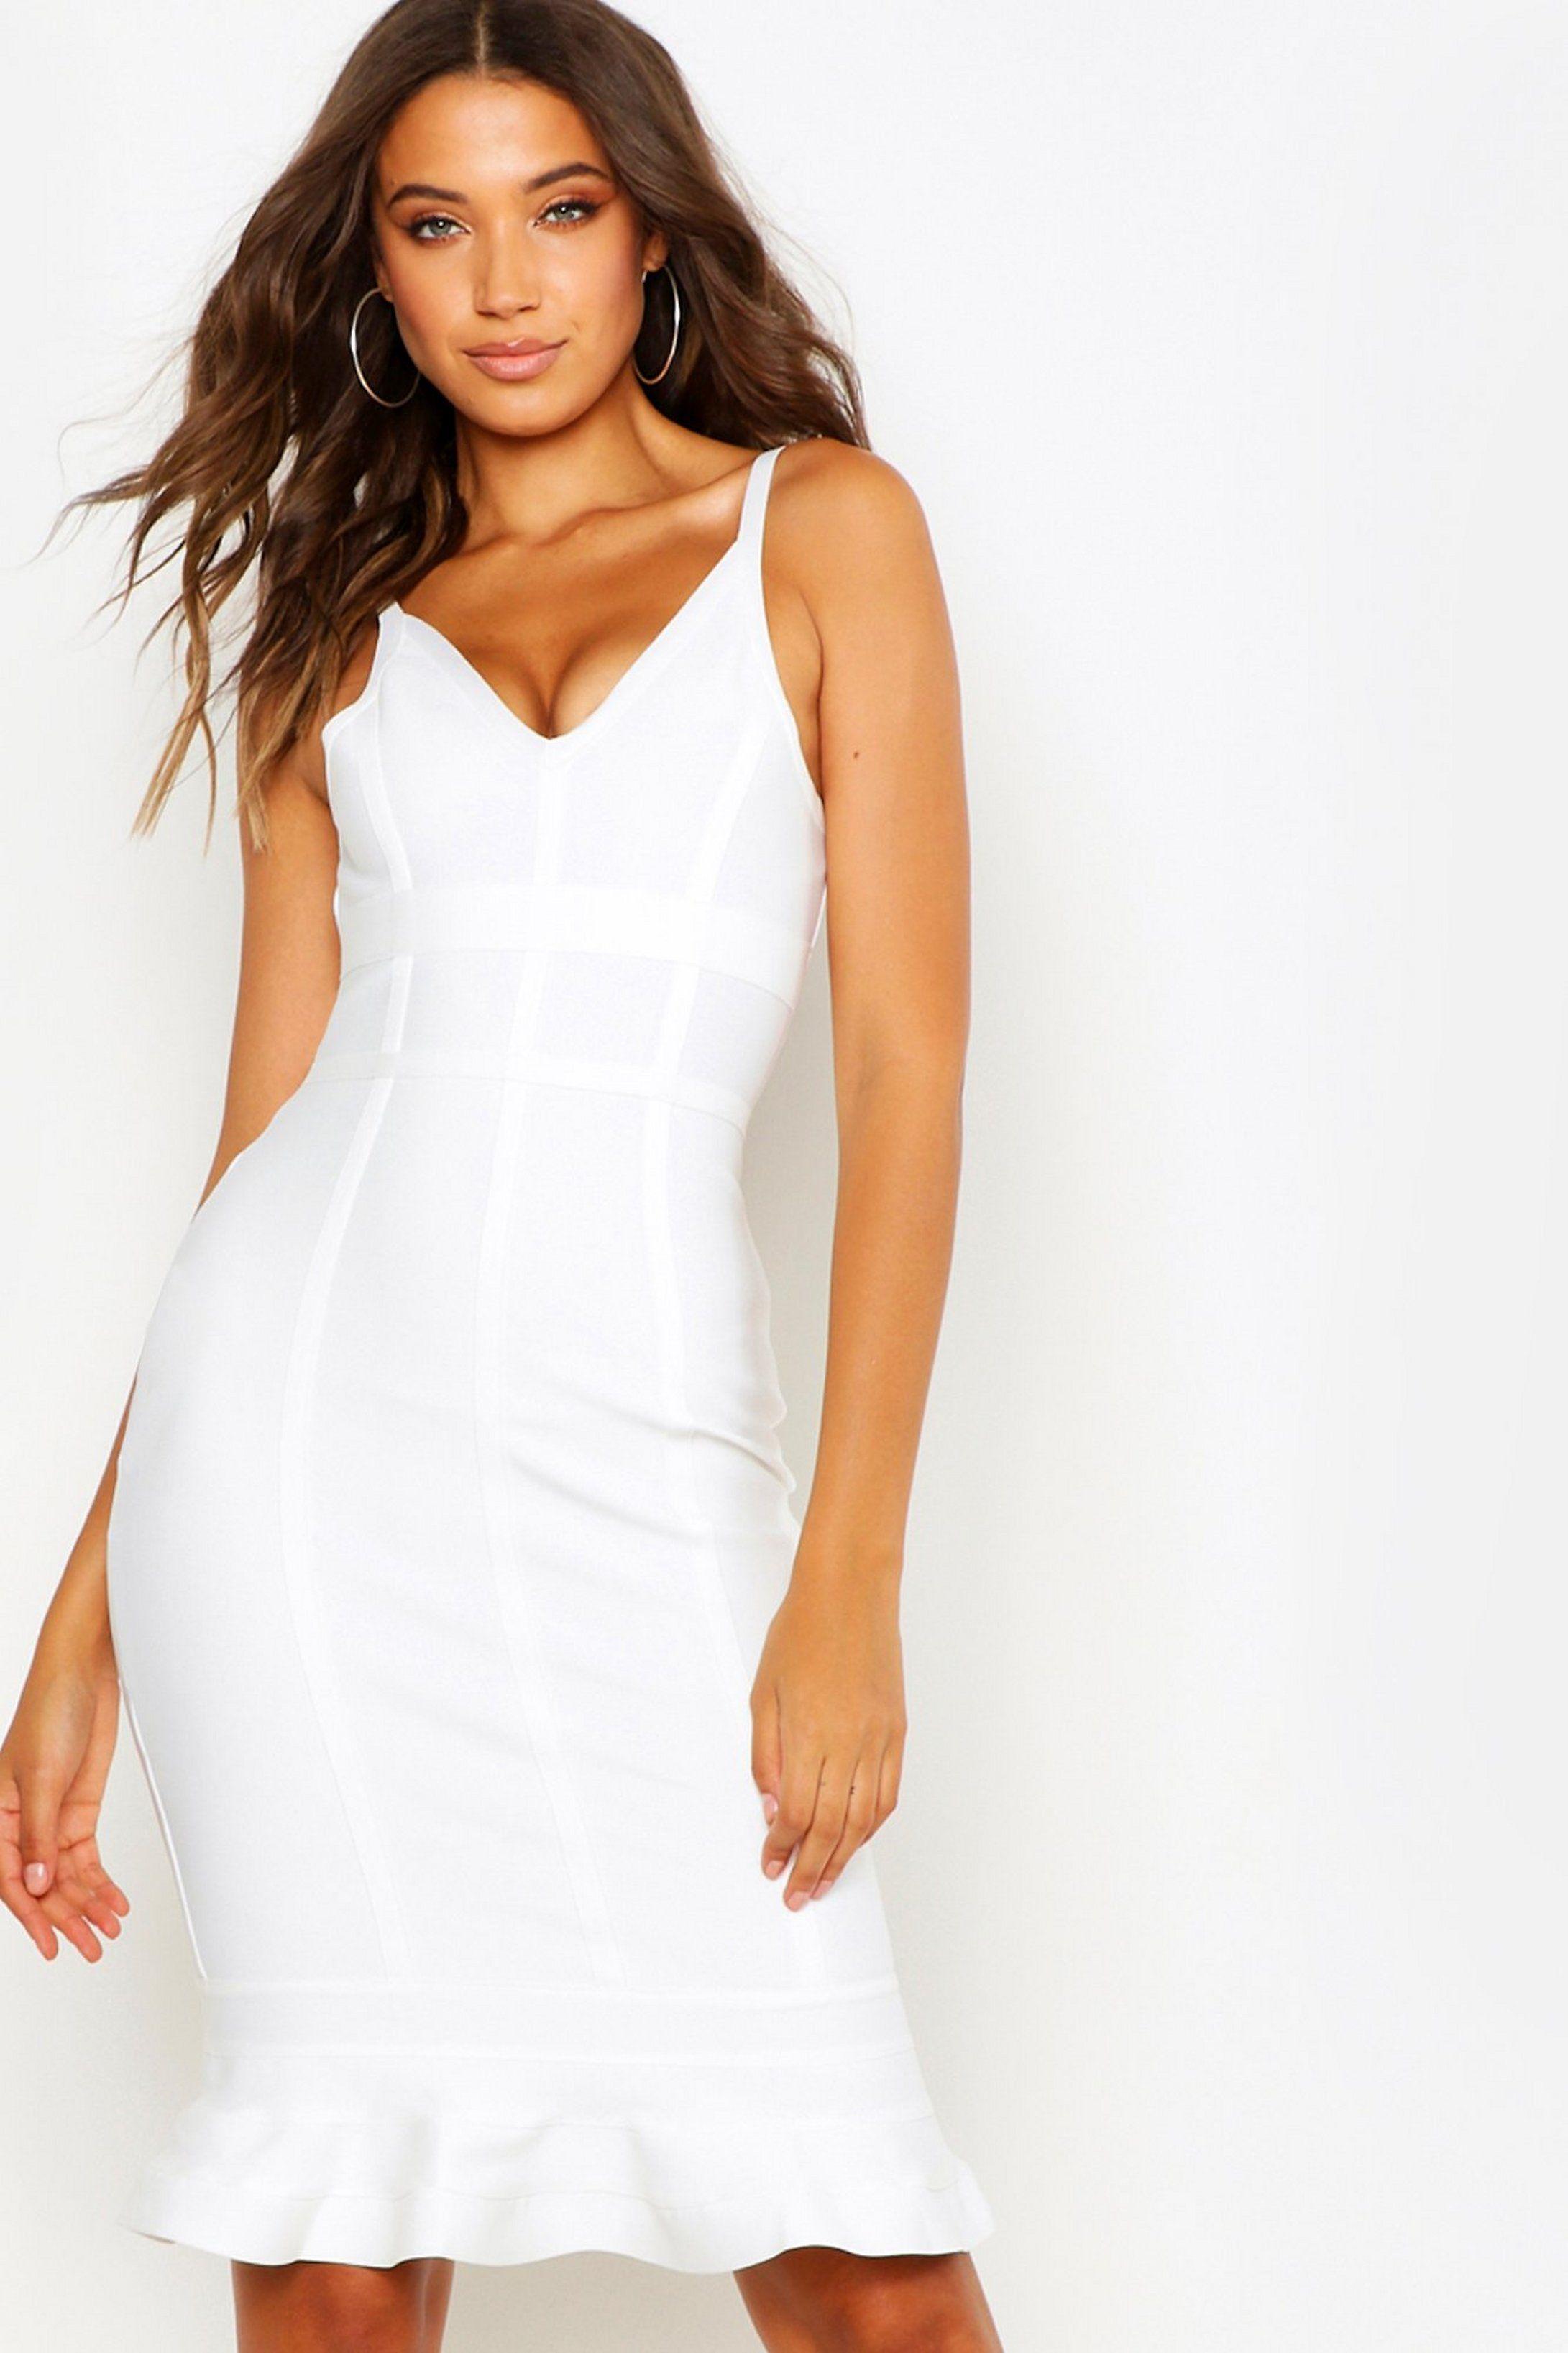 Tall Bandage Frill Hem Midi Dress Boohoo Dresses To Wear To A Wedding White Short Dress Clothing For Tall Women [ 3273 x 2181 Pixel ]